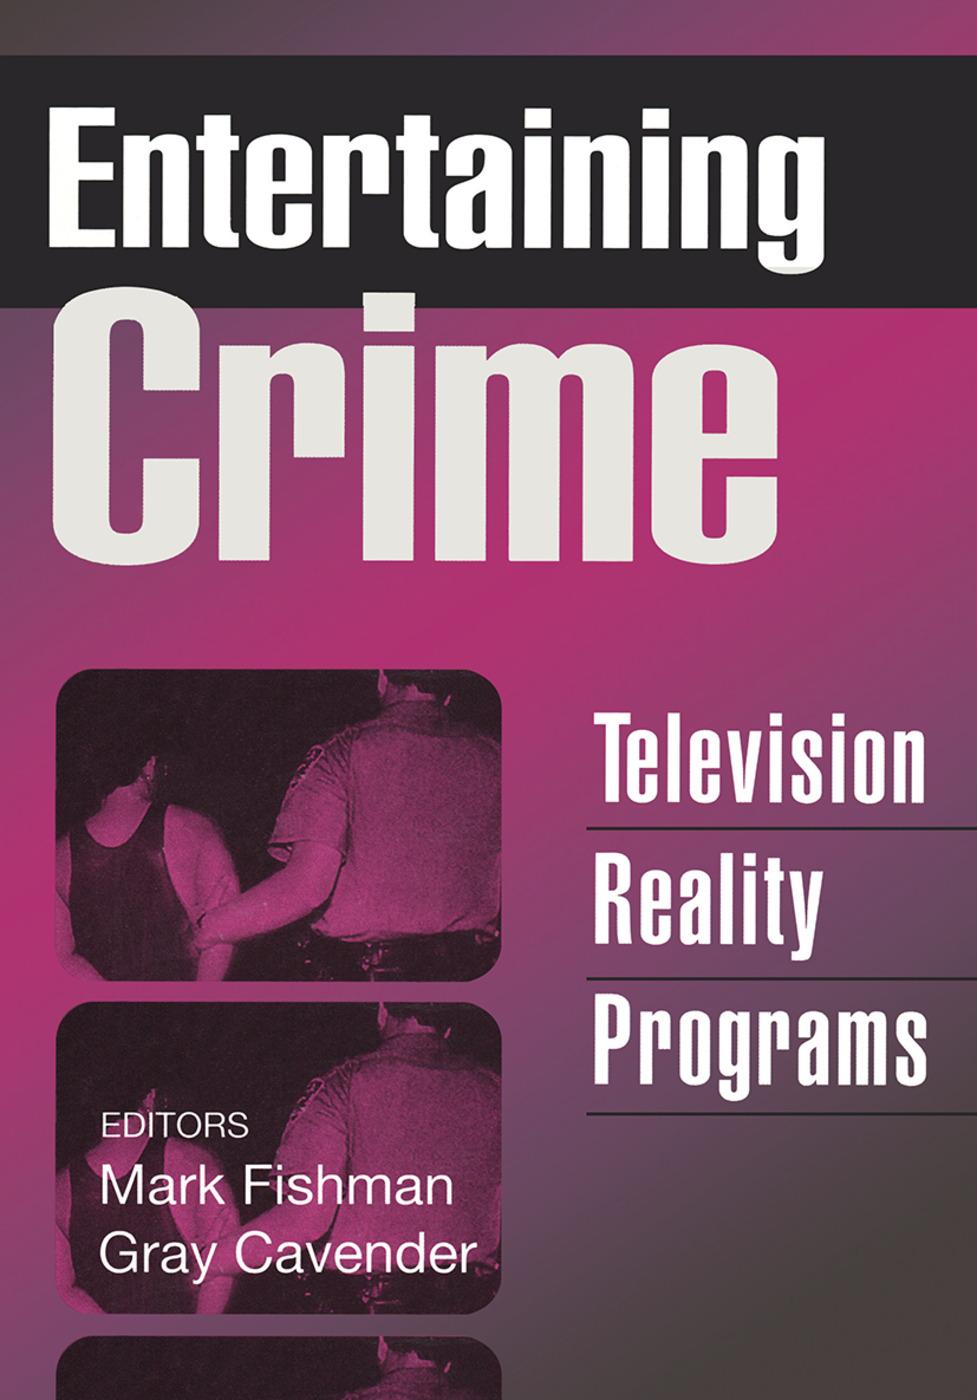 Entertaining Crime